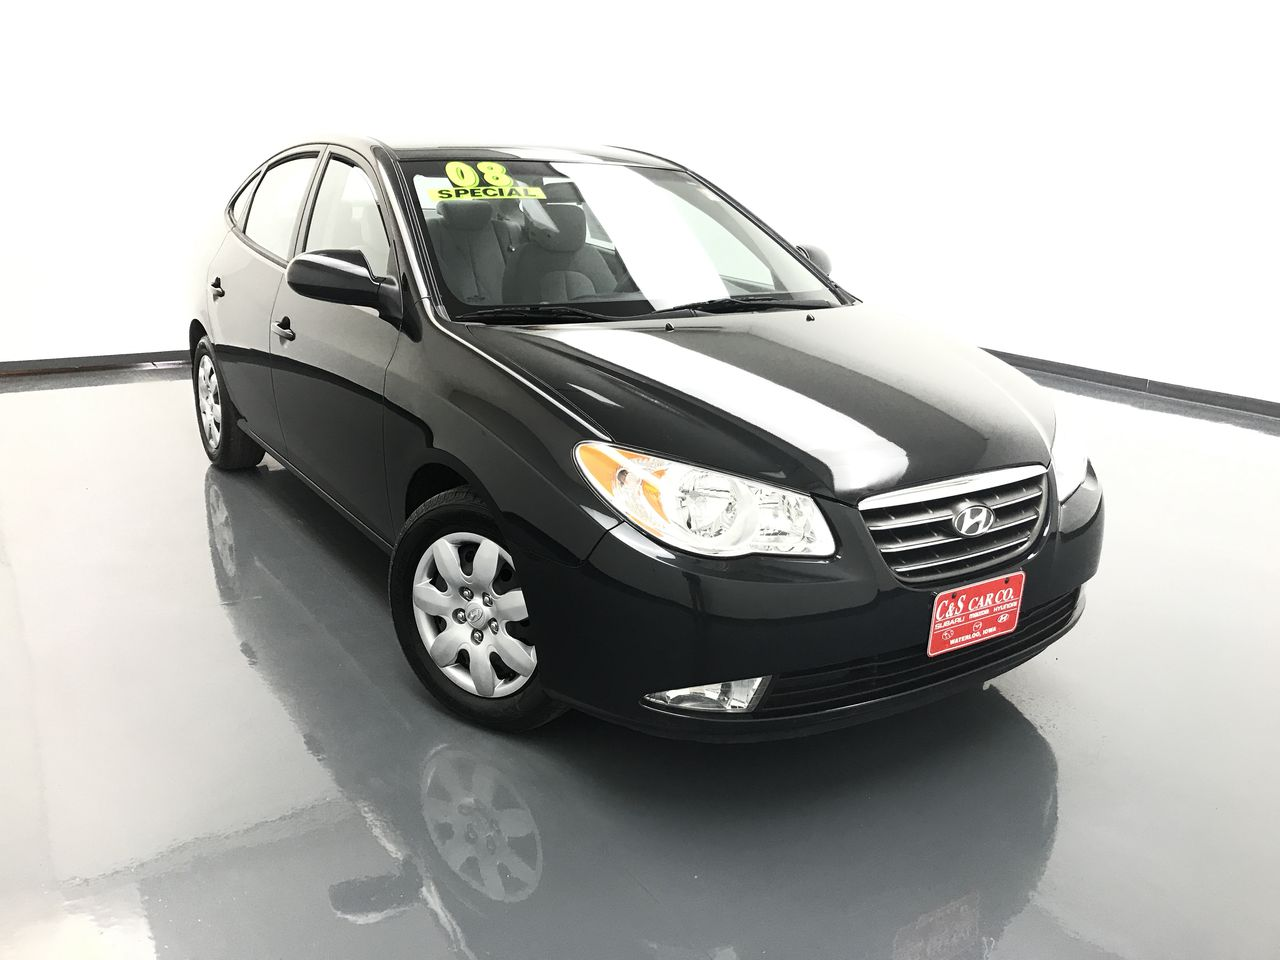 Thumbnail 2008 Hyundai Elantra   C U0026 S Car Company II ...